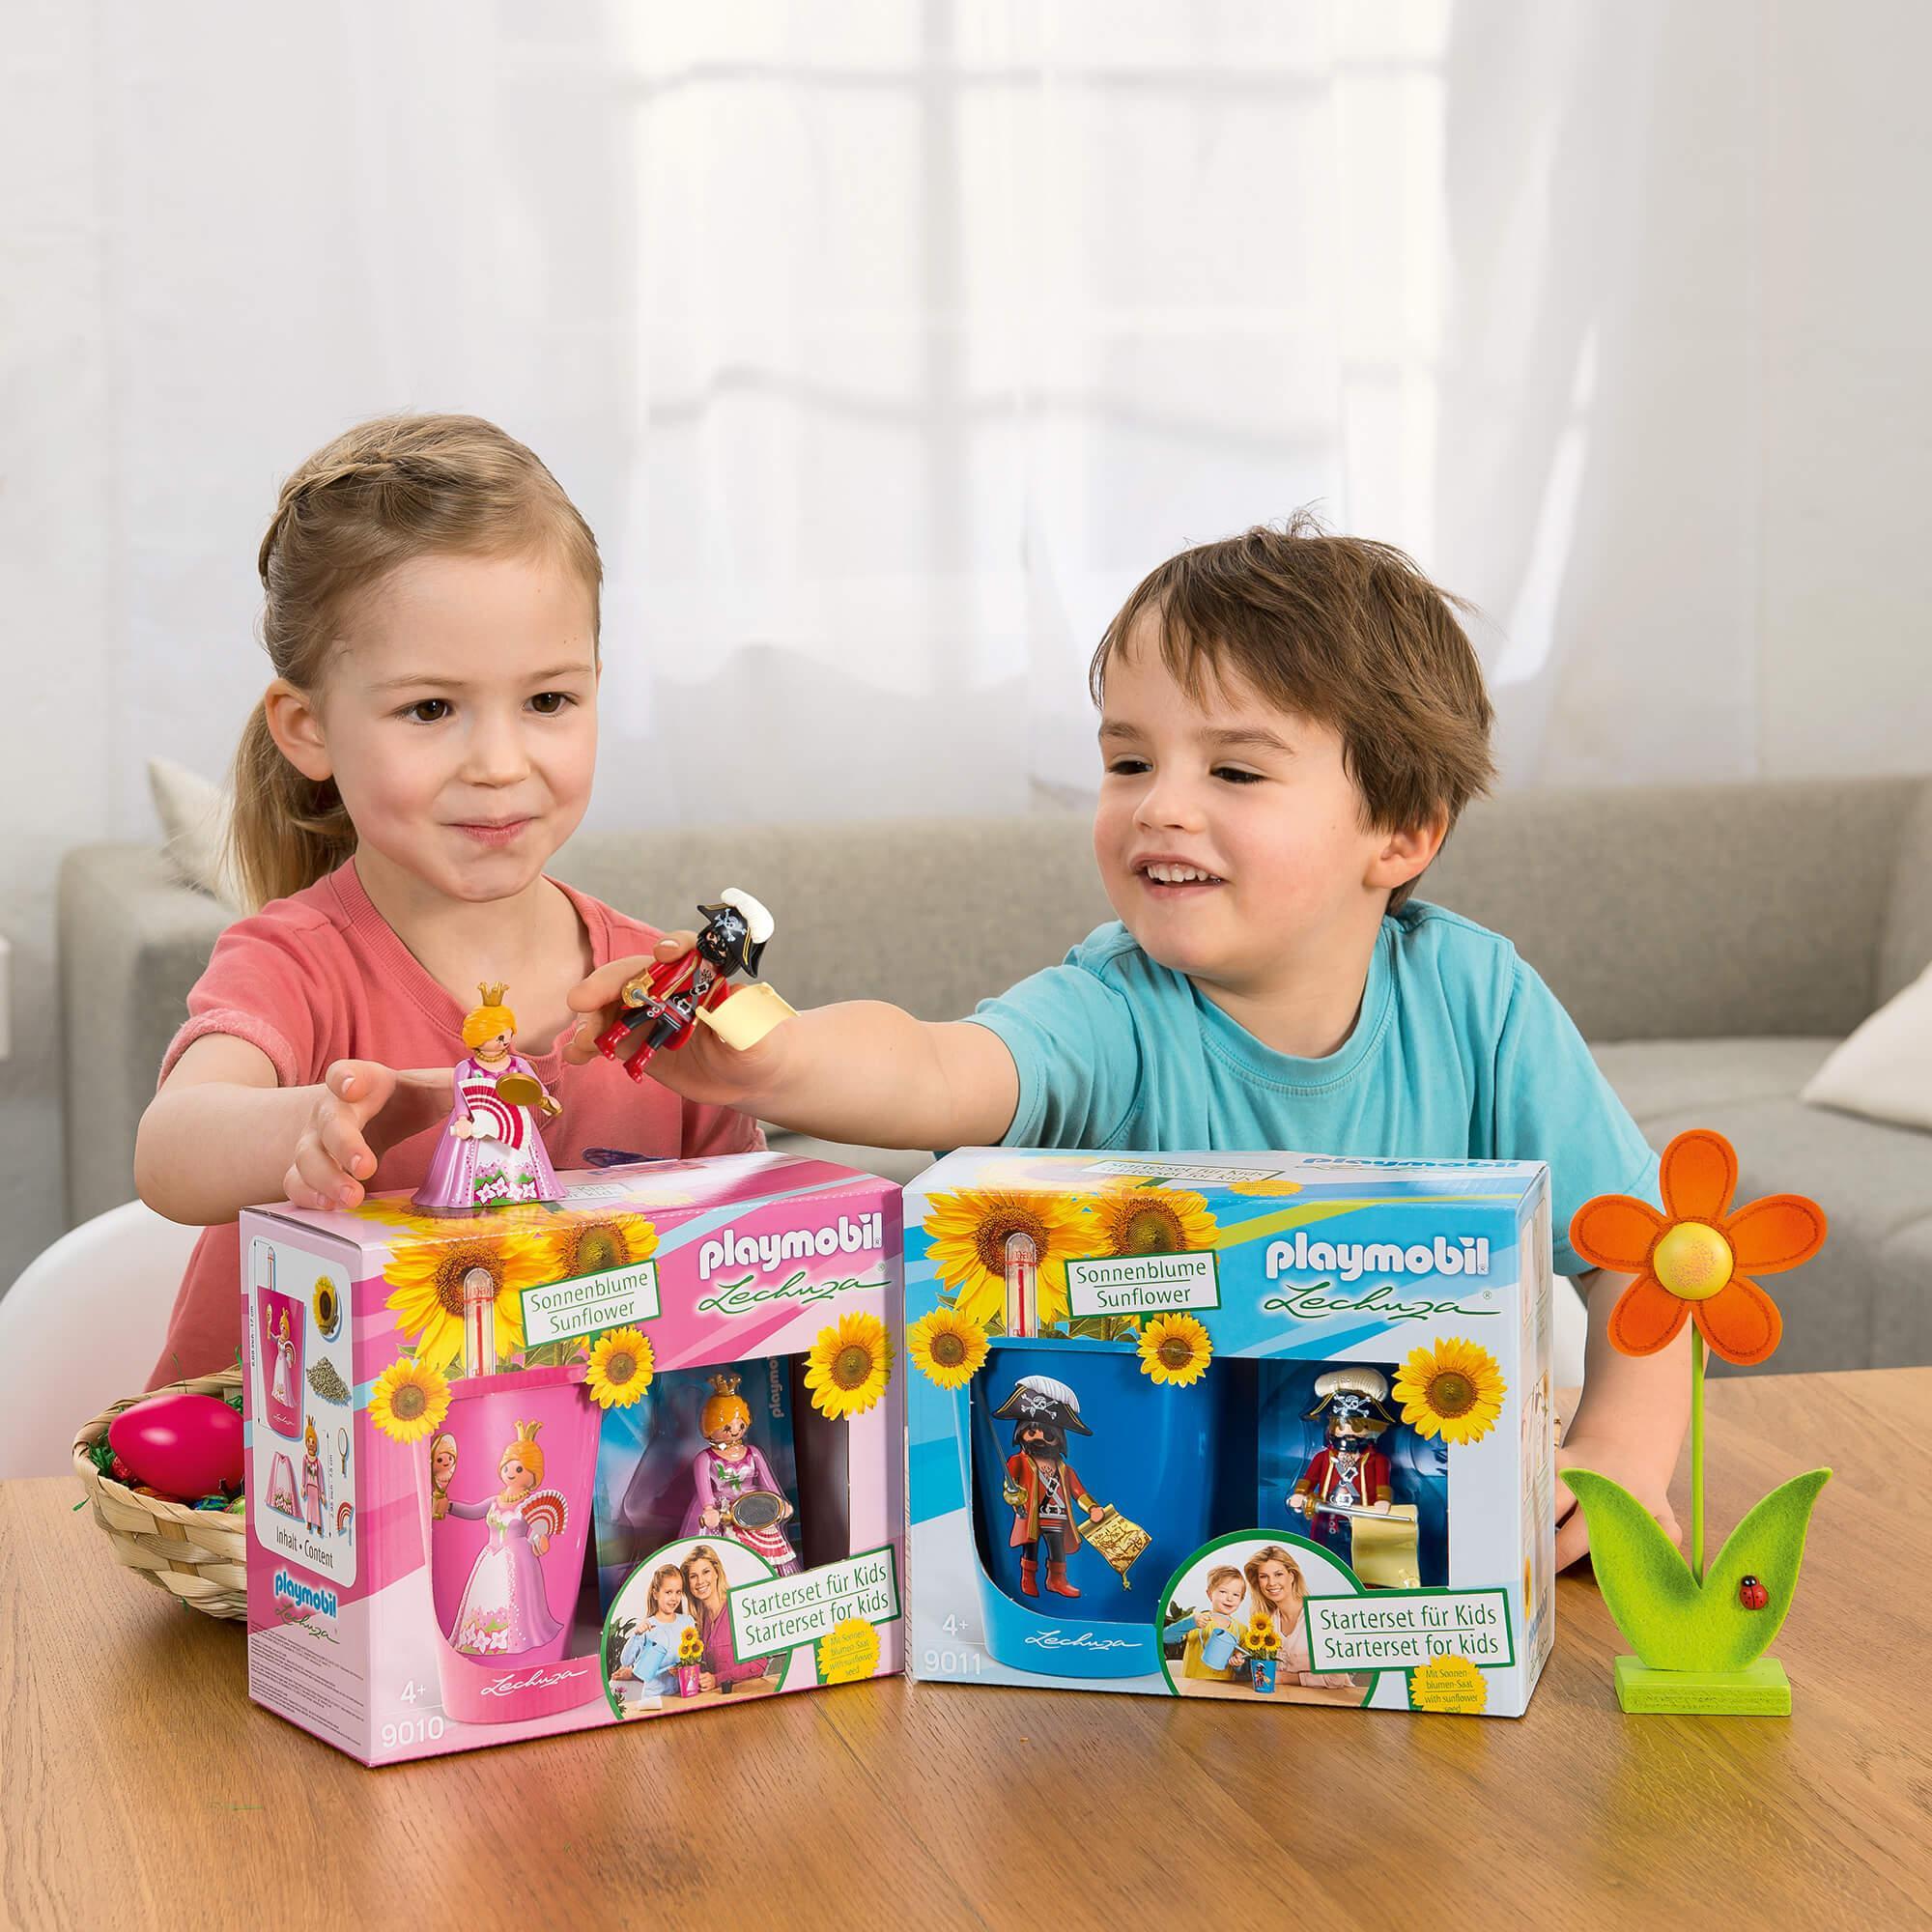 le_starter-set-fuer-kids_product_addi_01